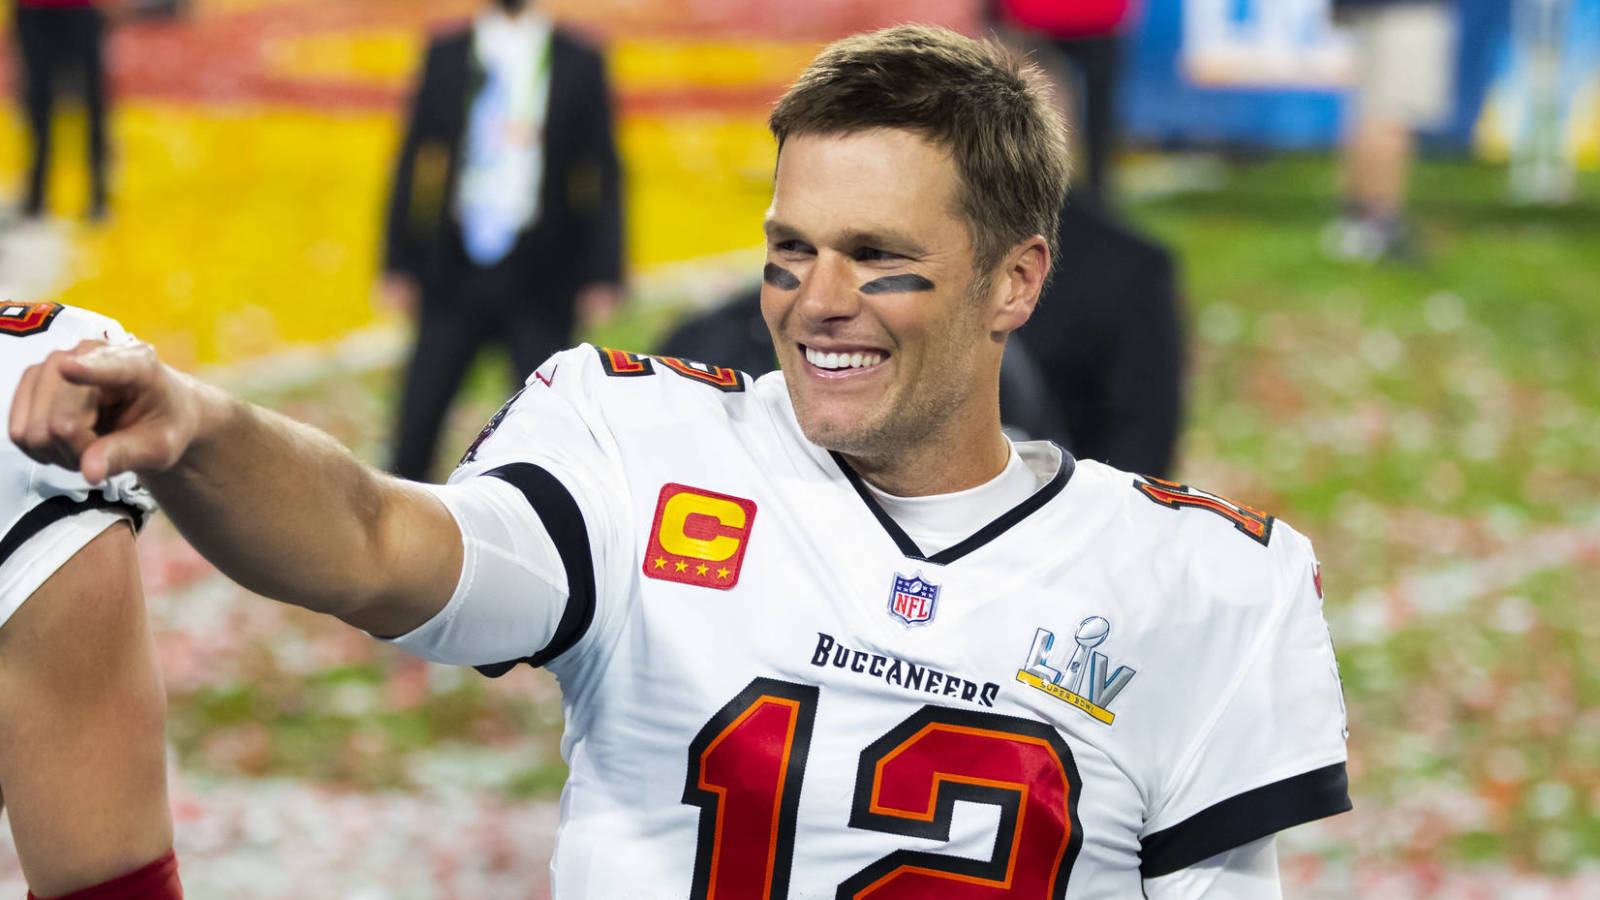 Tom Brady's arrival boosts Buccaneers merchandise sales in 2020 ...